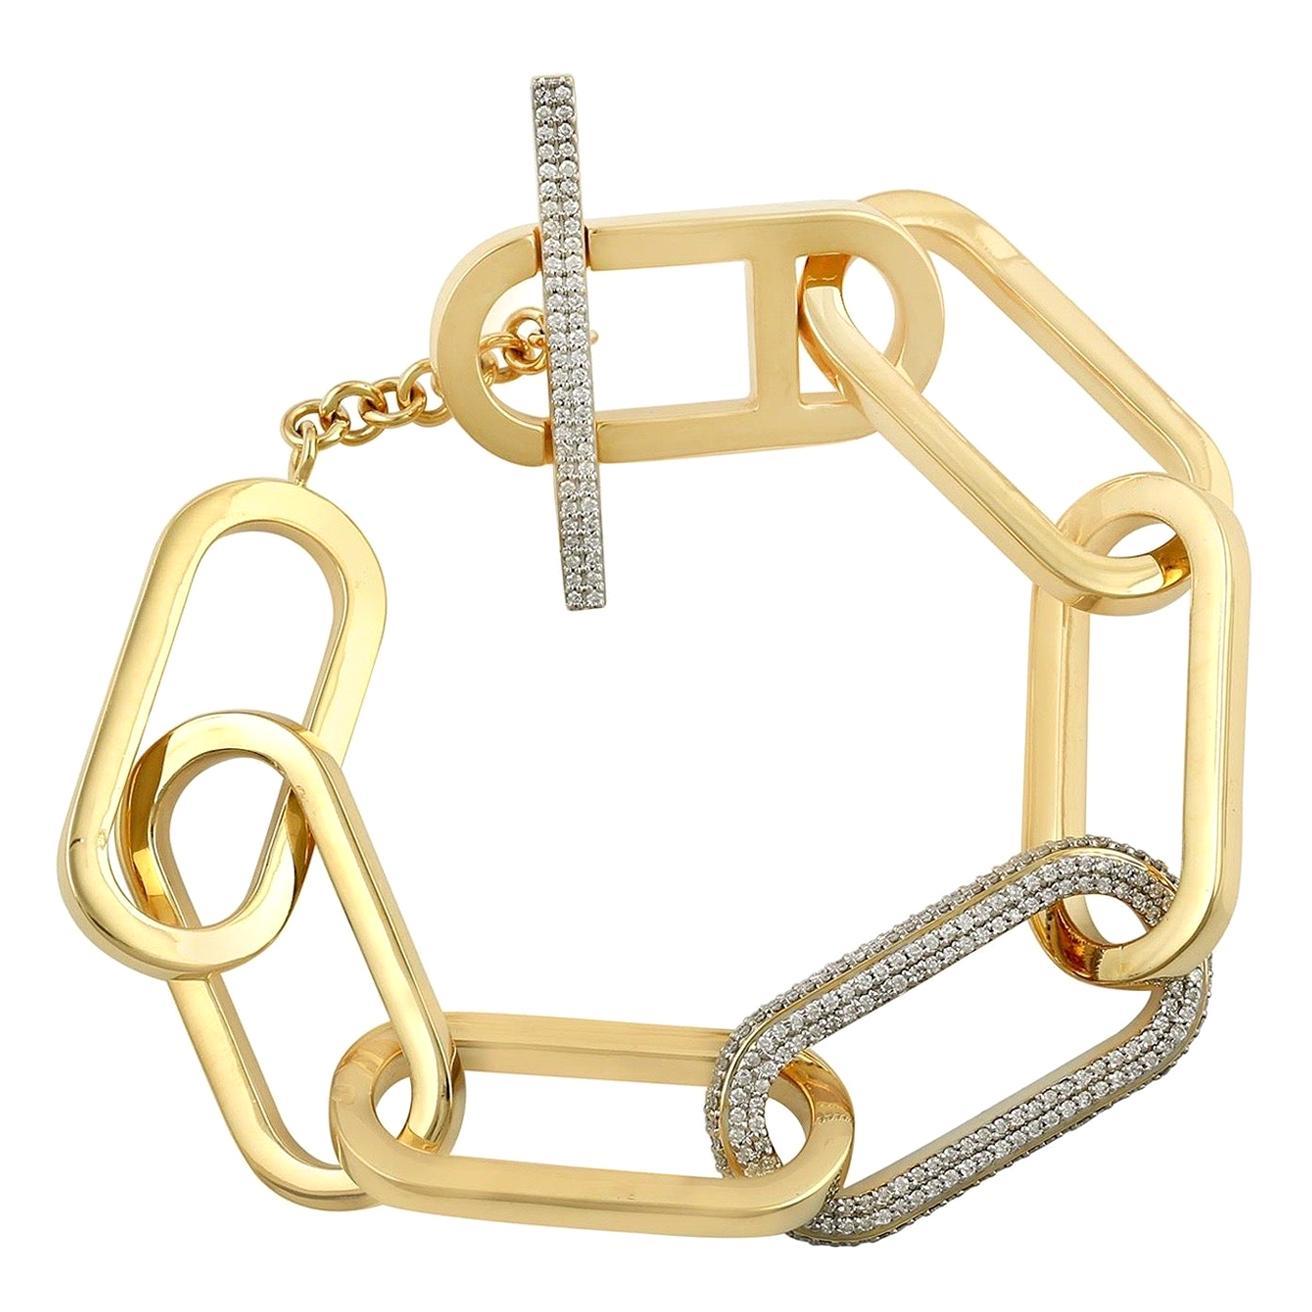 Link Chain Diamond 18 Karat Gold Bracelet